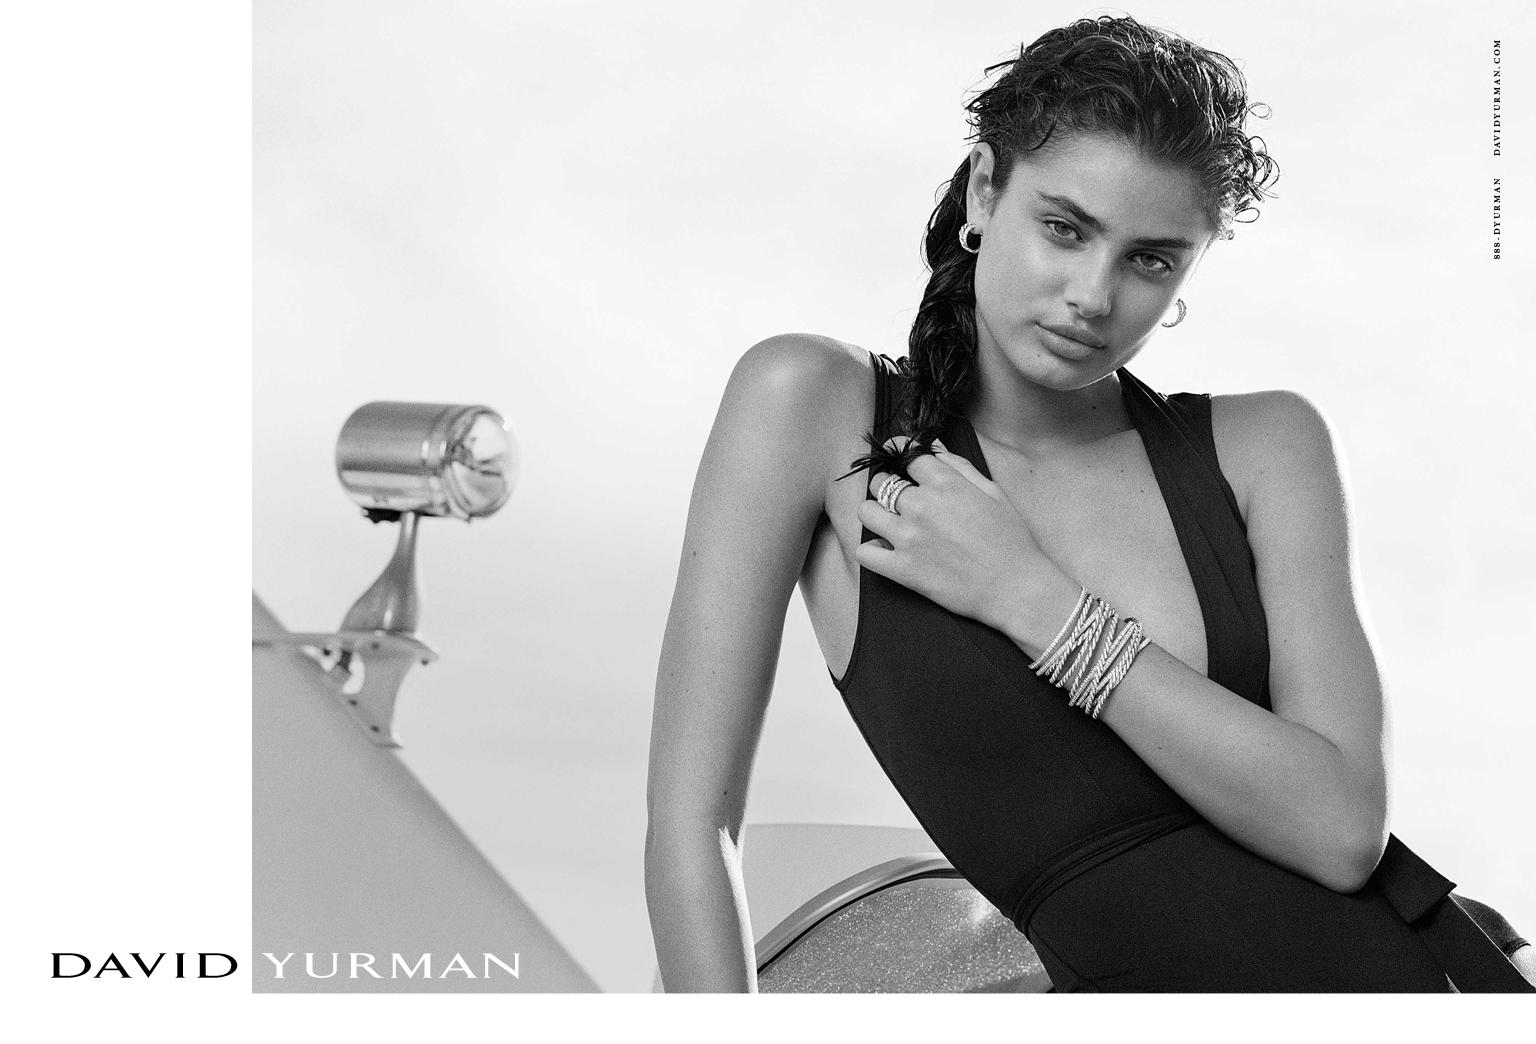 Client: David Yurman Season: Spring / Summer 2017 Photography: Bruce Weber Art Director: Sam Shahid Models: Natalia Vodianova, Taylor Hill Product: Stacks